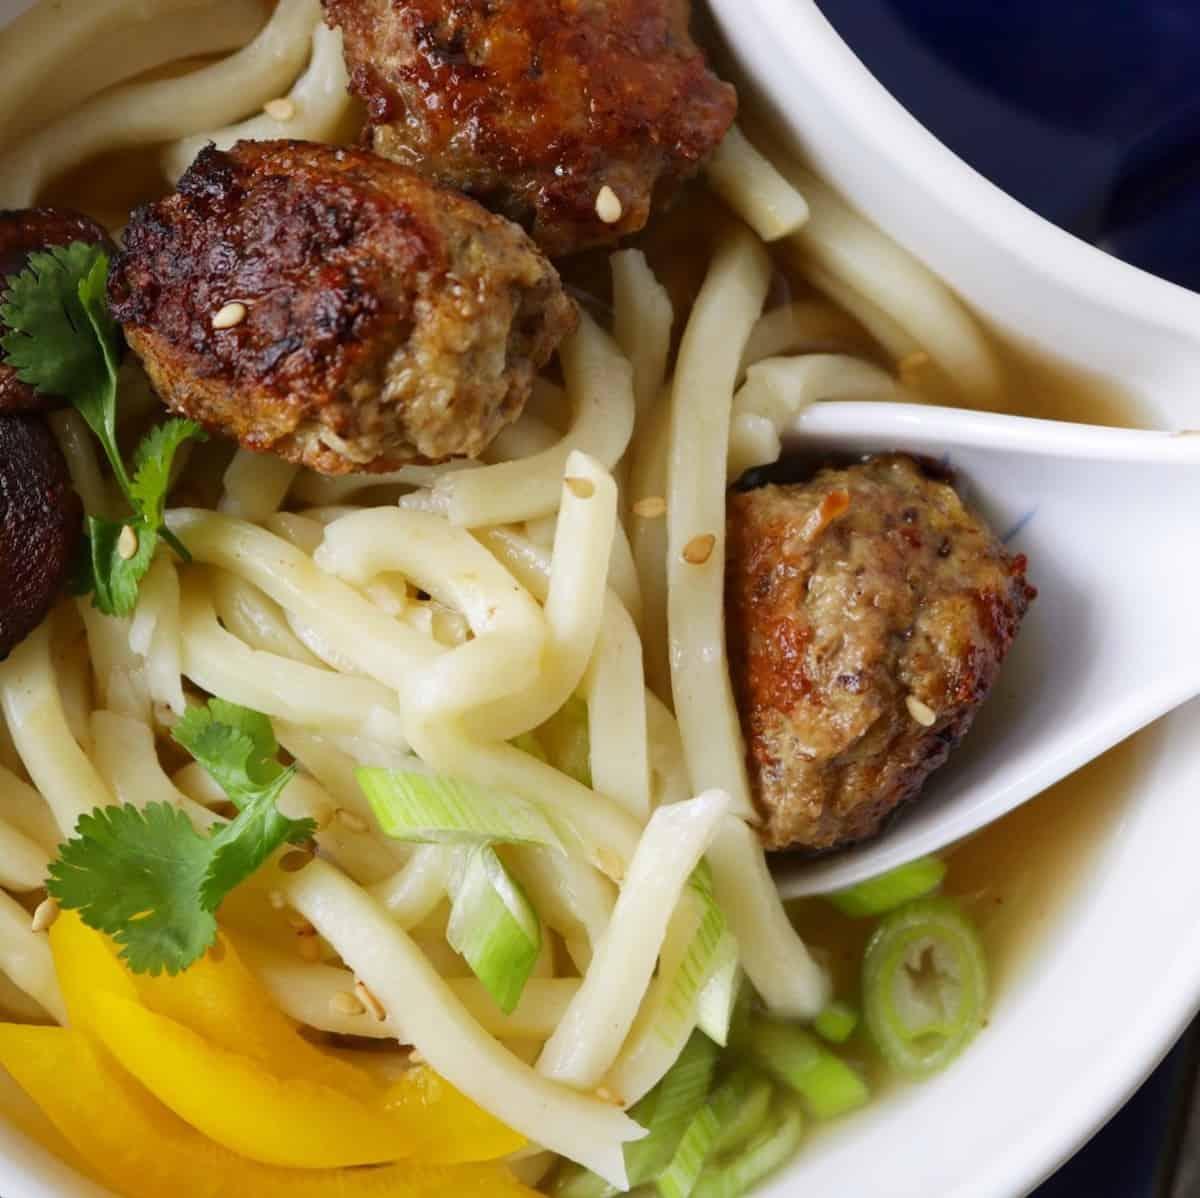 bowl of Asian meatball noodle soup